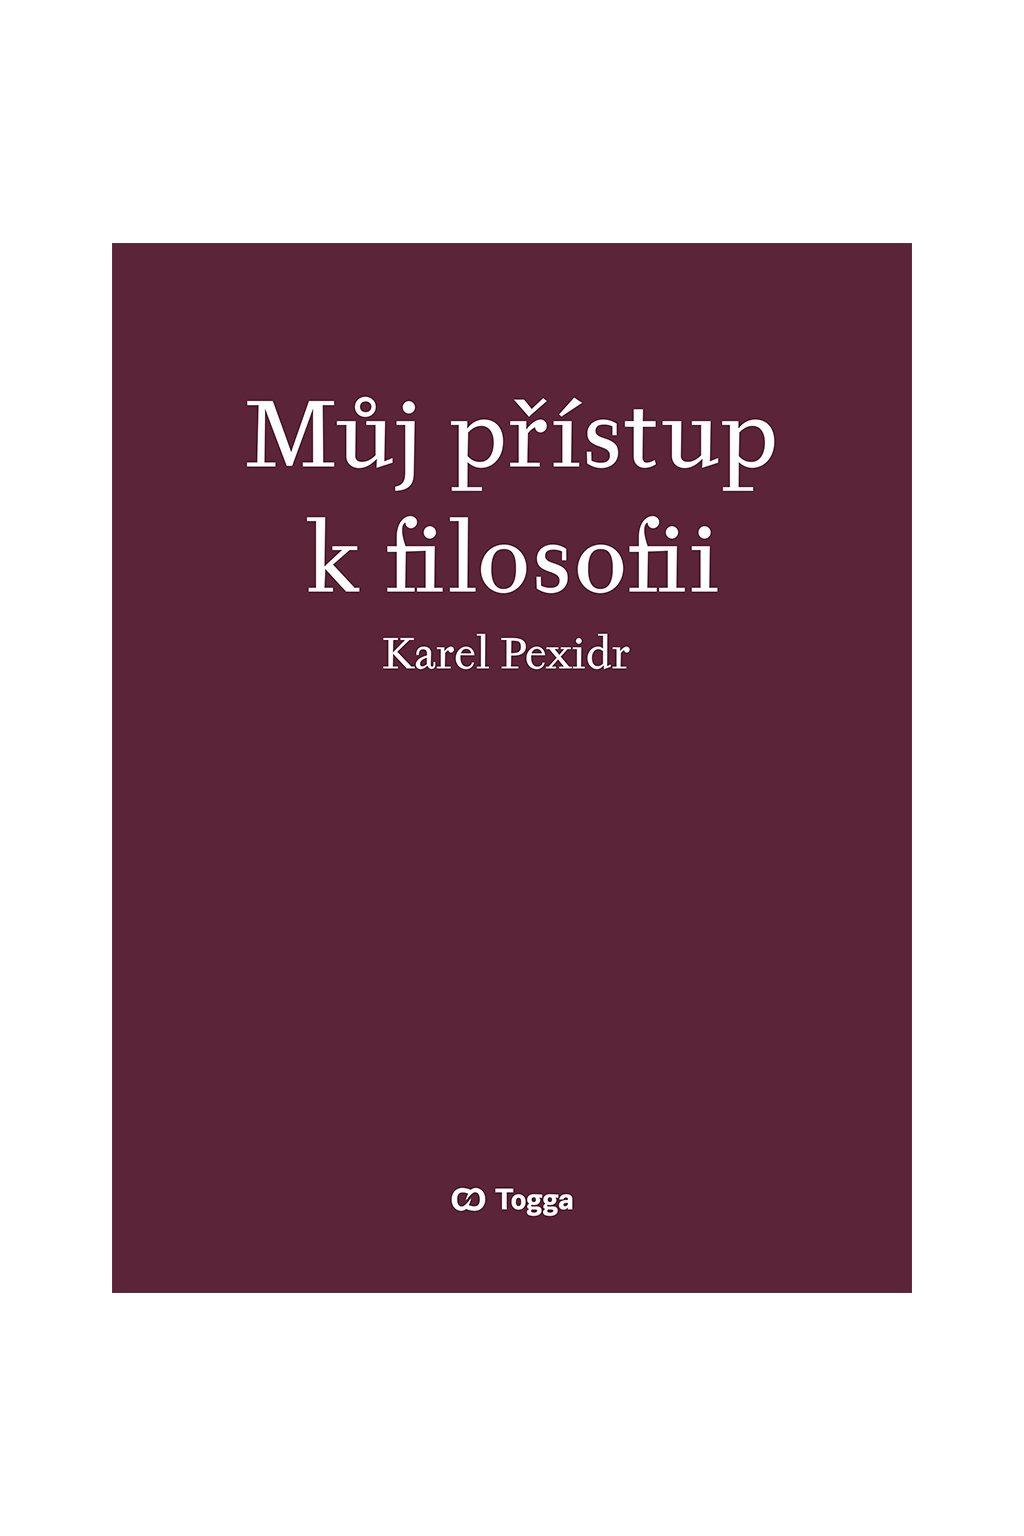 obalka MUJ PRISTUP K FILOSOFII 978 80 7476 110 2